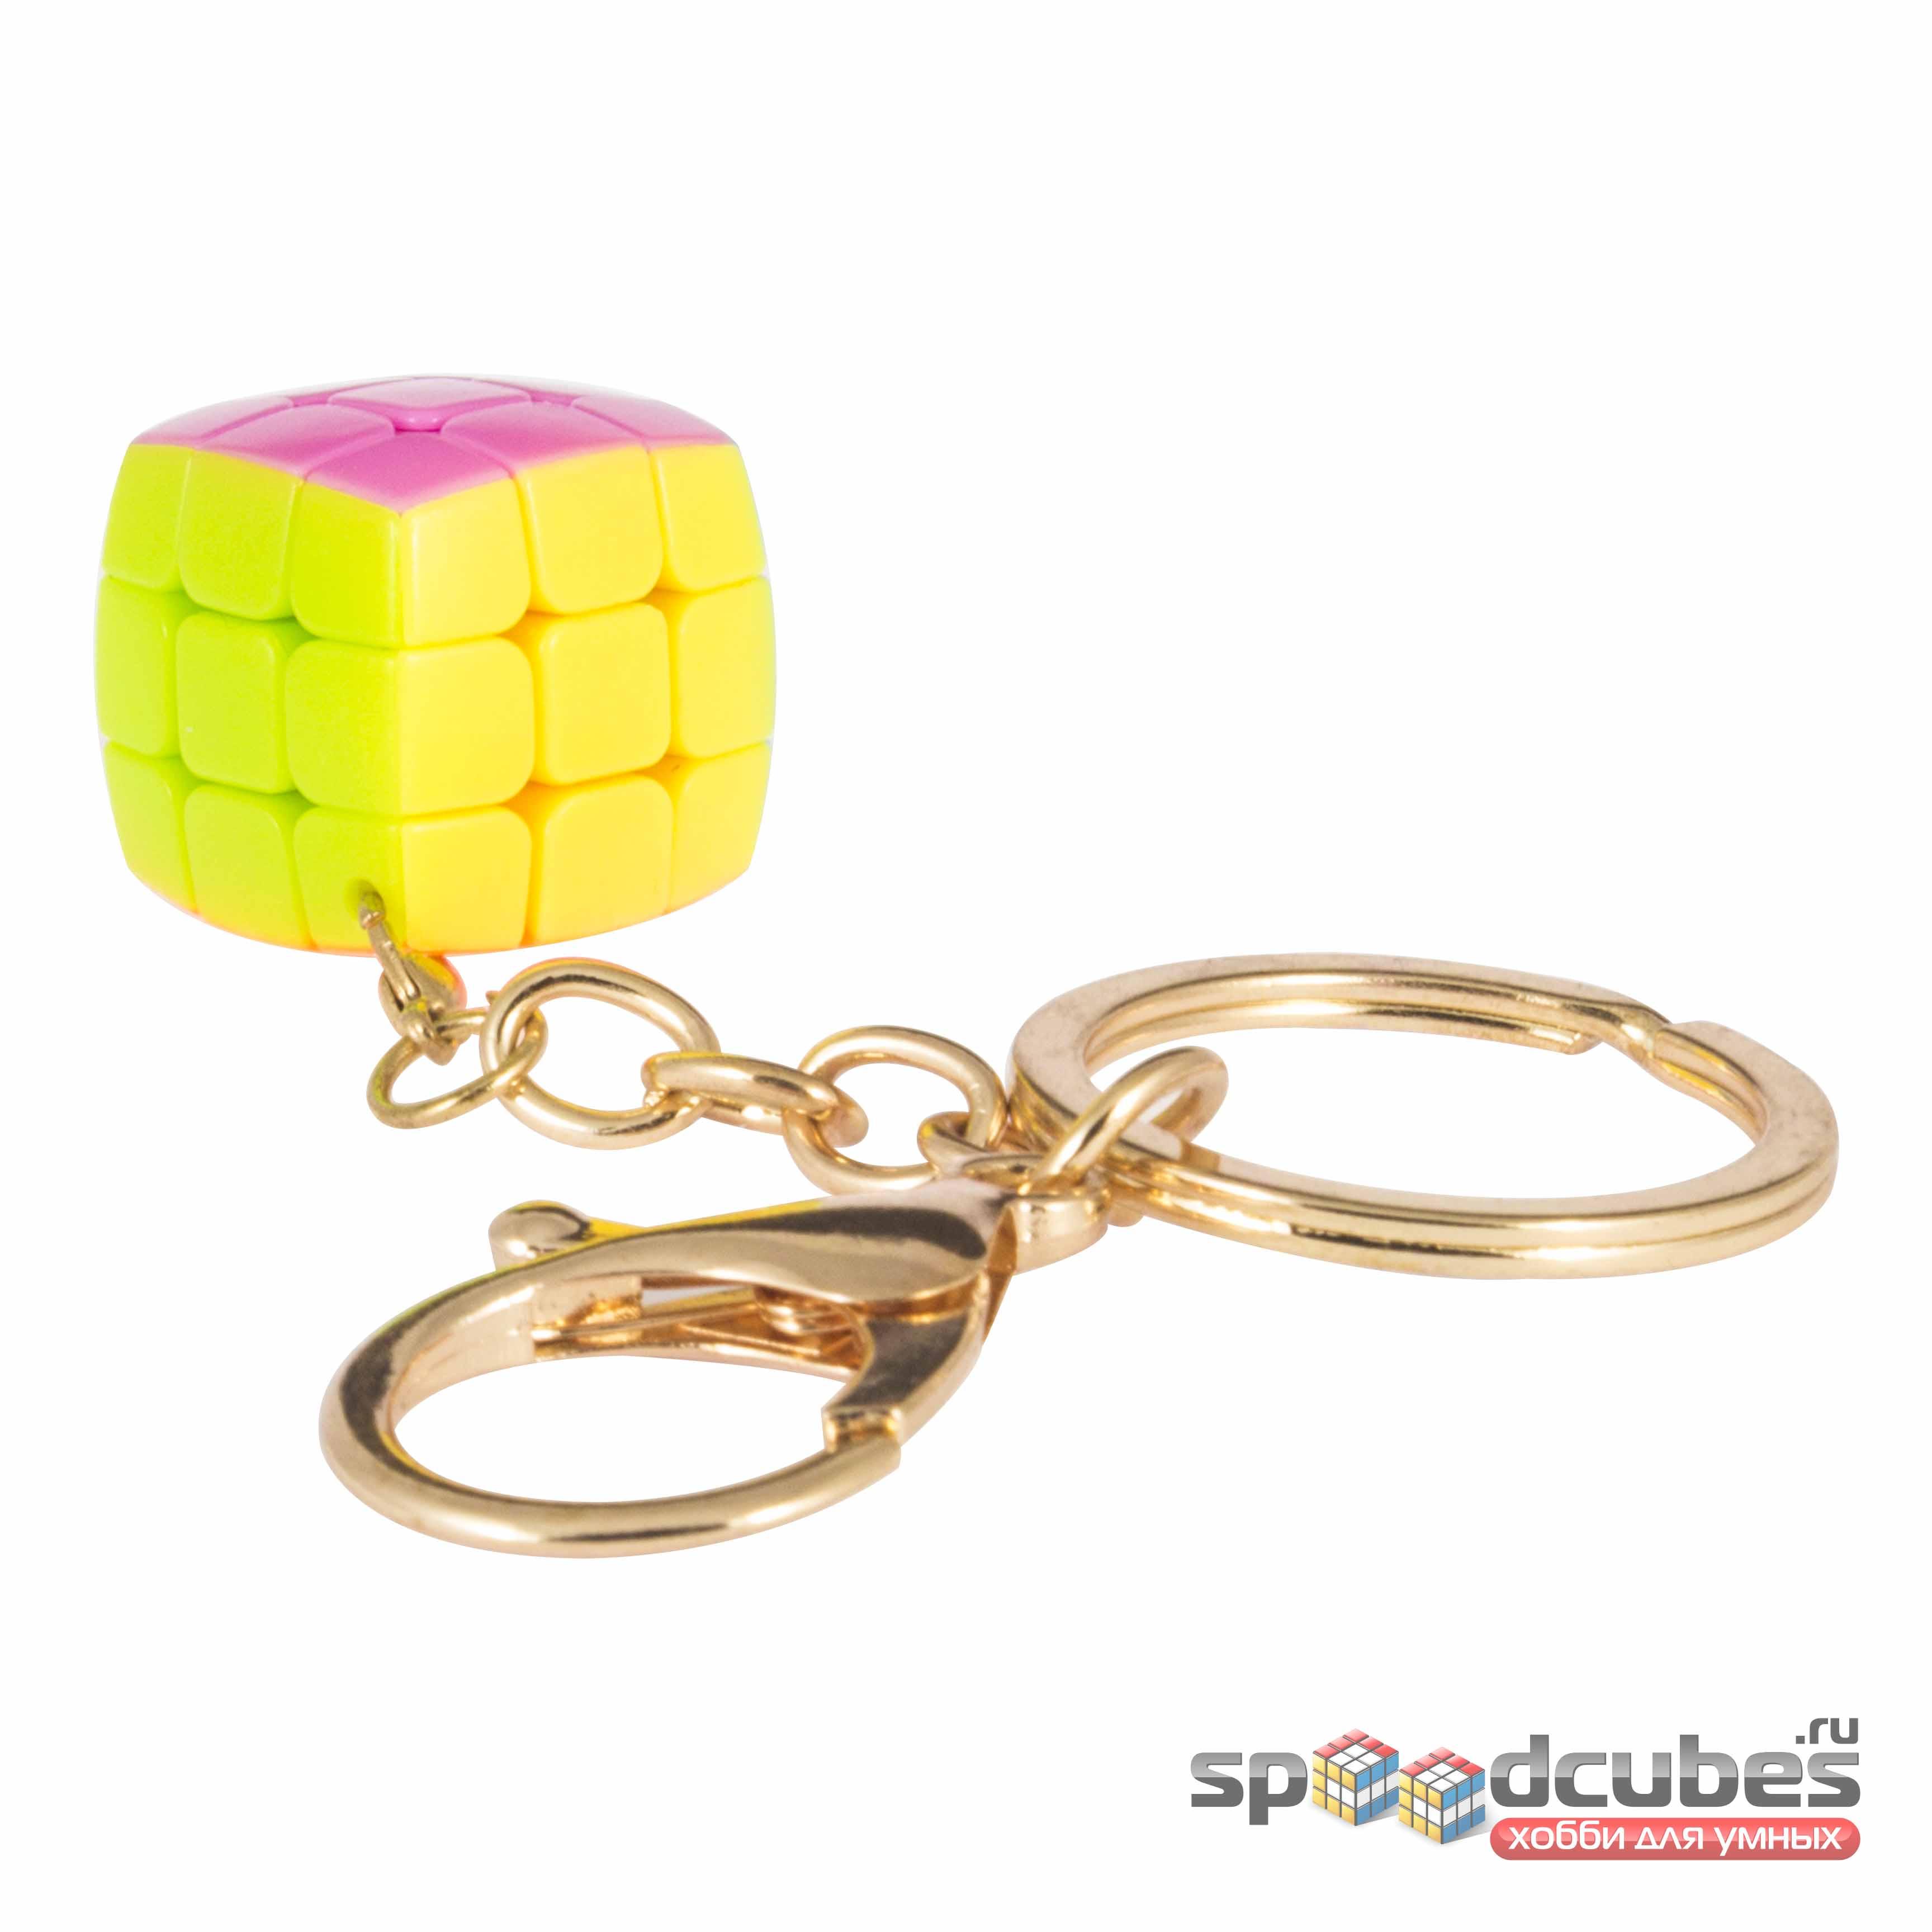 YJ 3x3x3 брелок MiniBread Cube 2.0 см